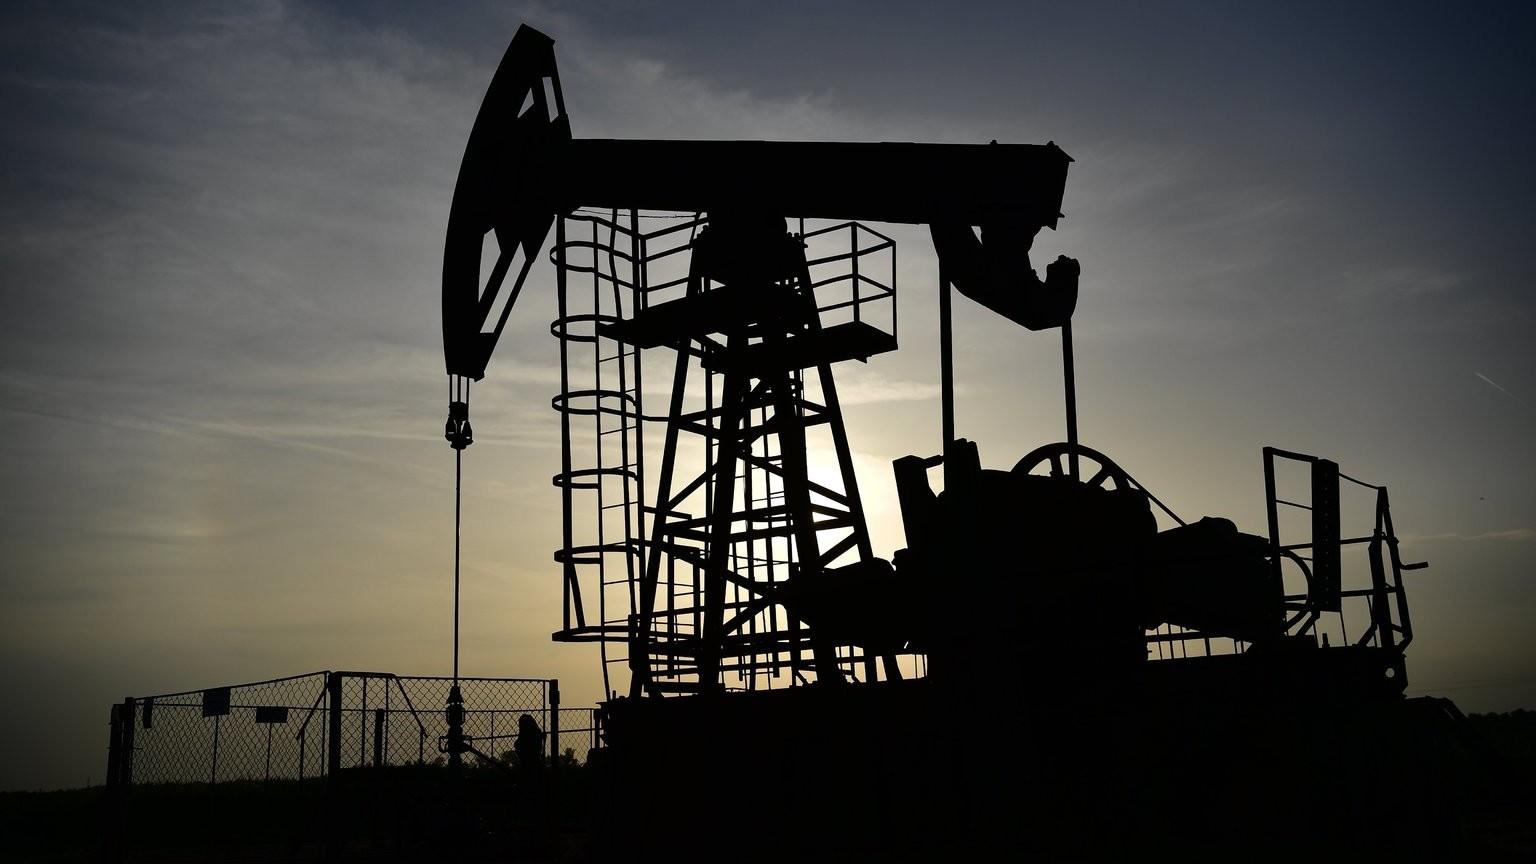 kőolaj kereskedelem